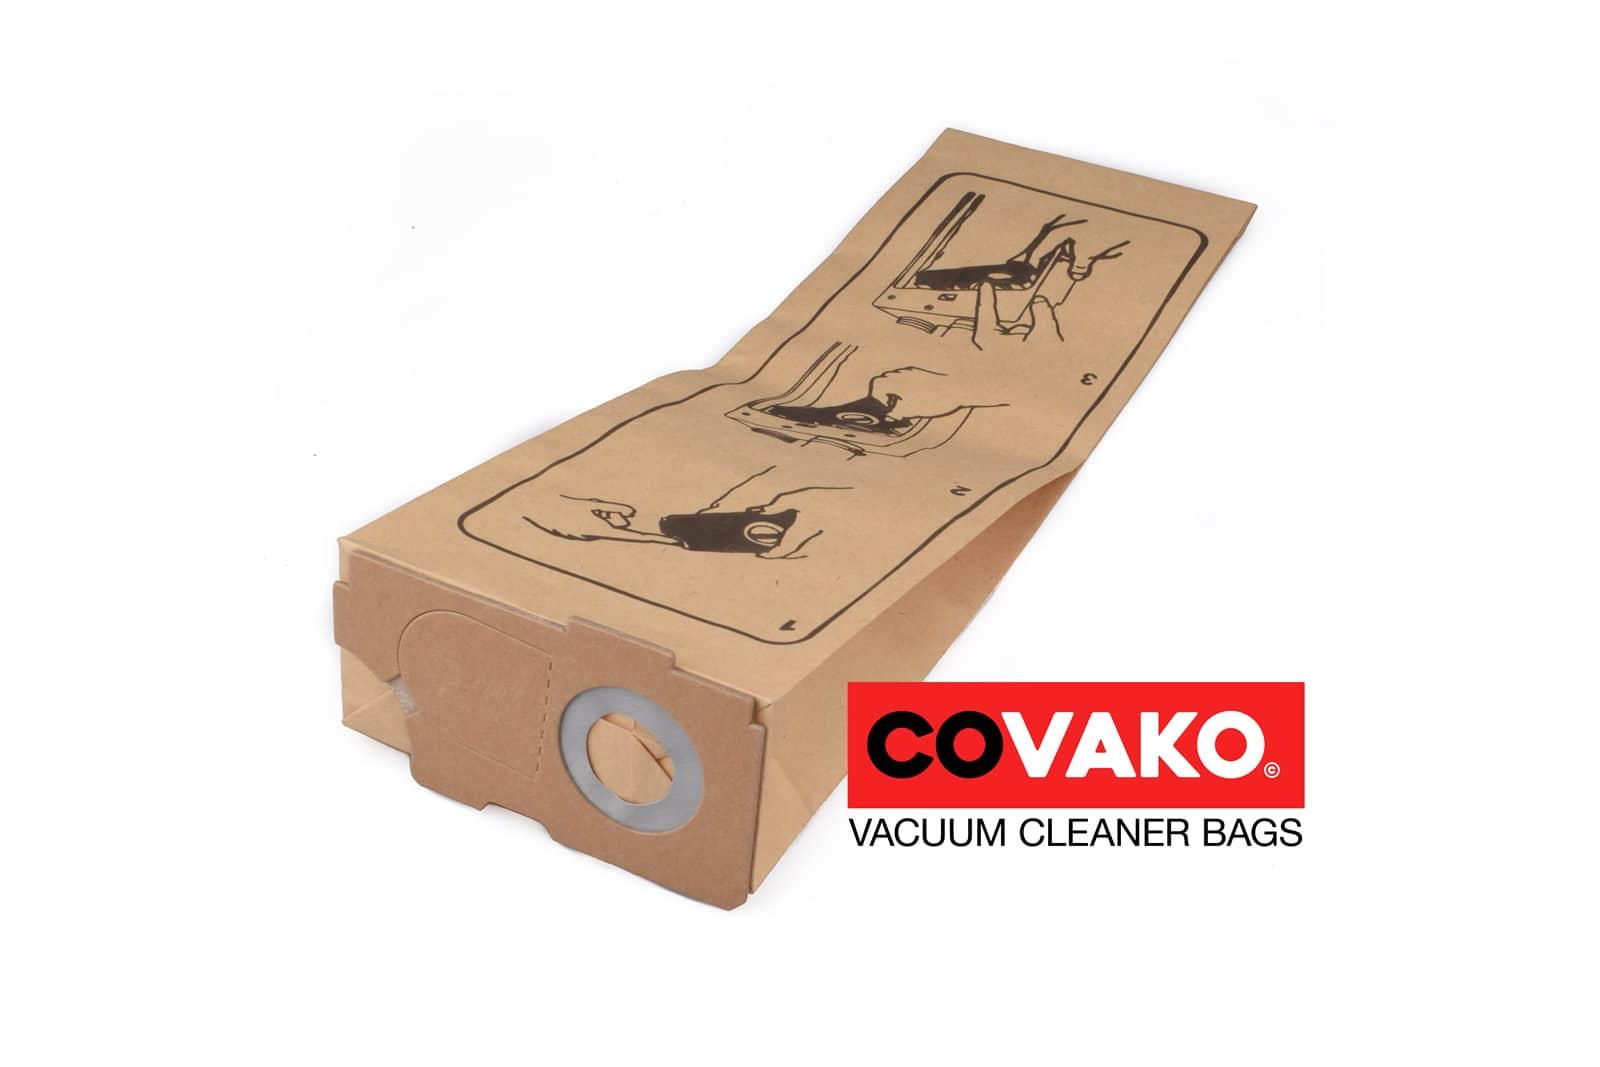 Columbus BS 460 / Paper - Columbus vacuum cleaner bags